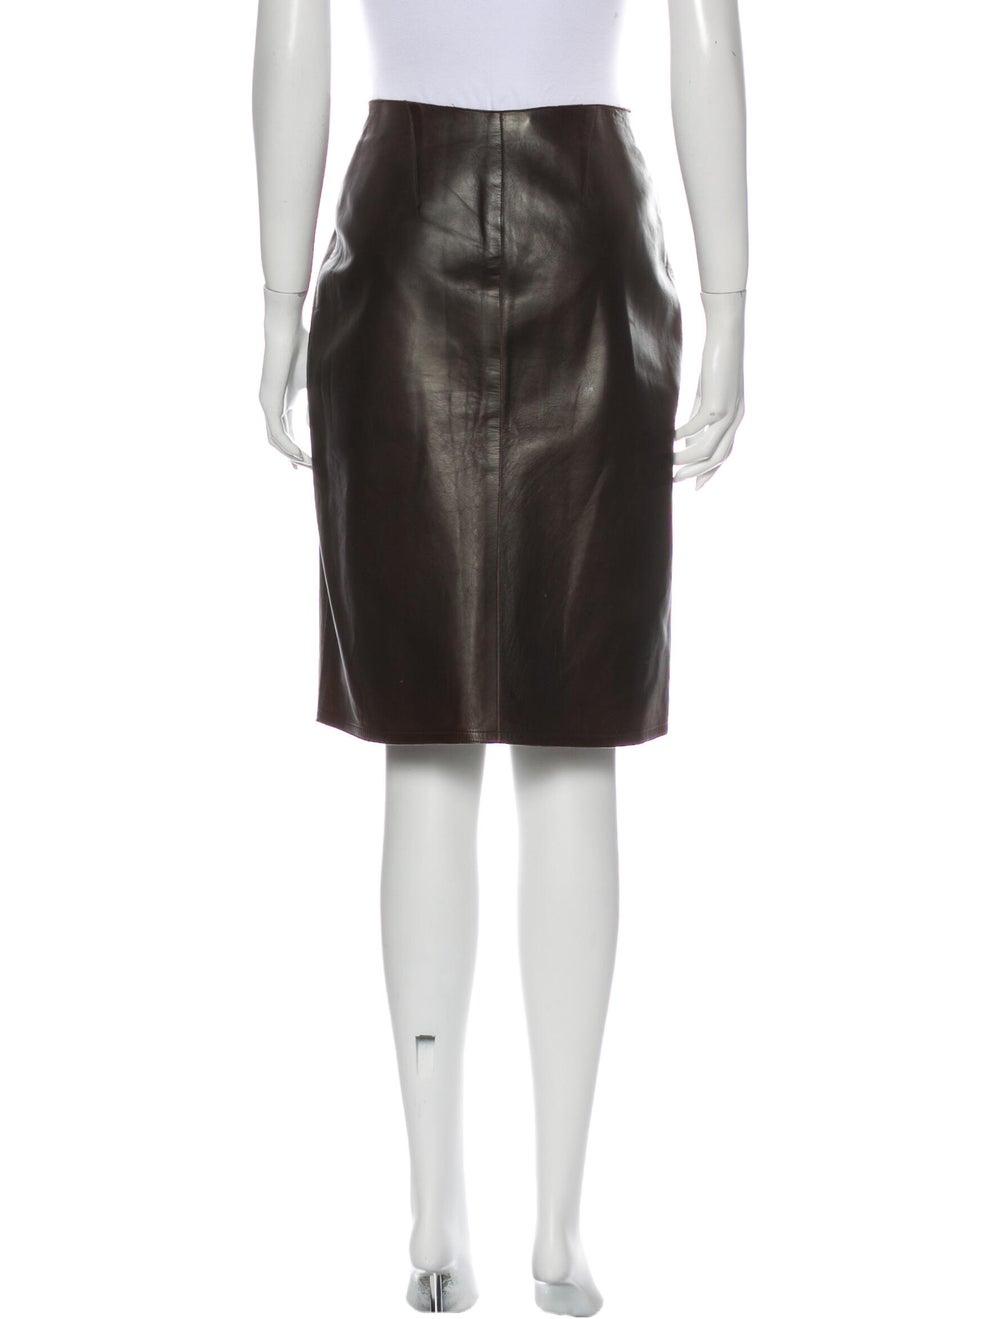 Chanel Vintage Knee-Length Skirt Brown - image 3